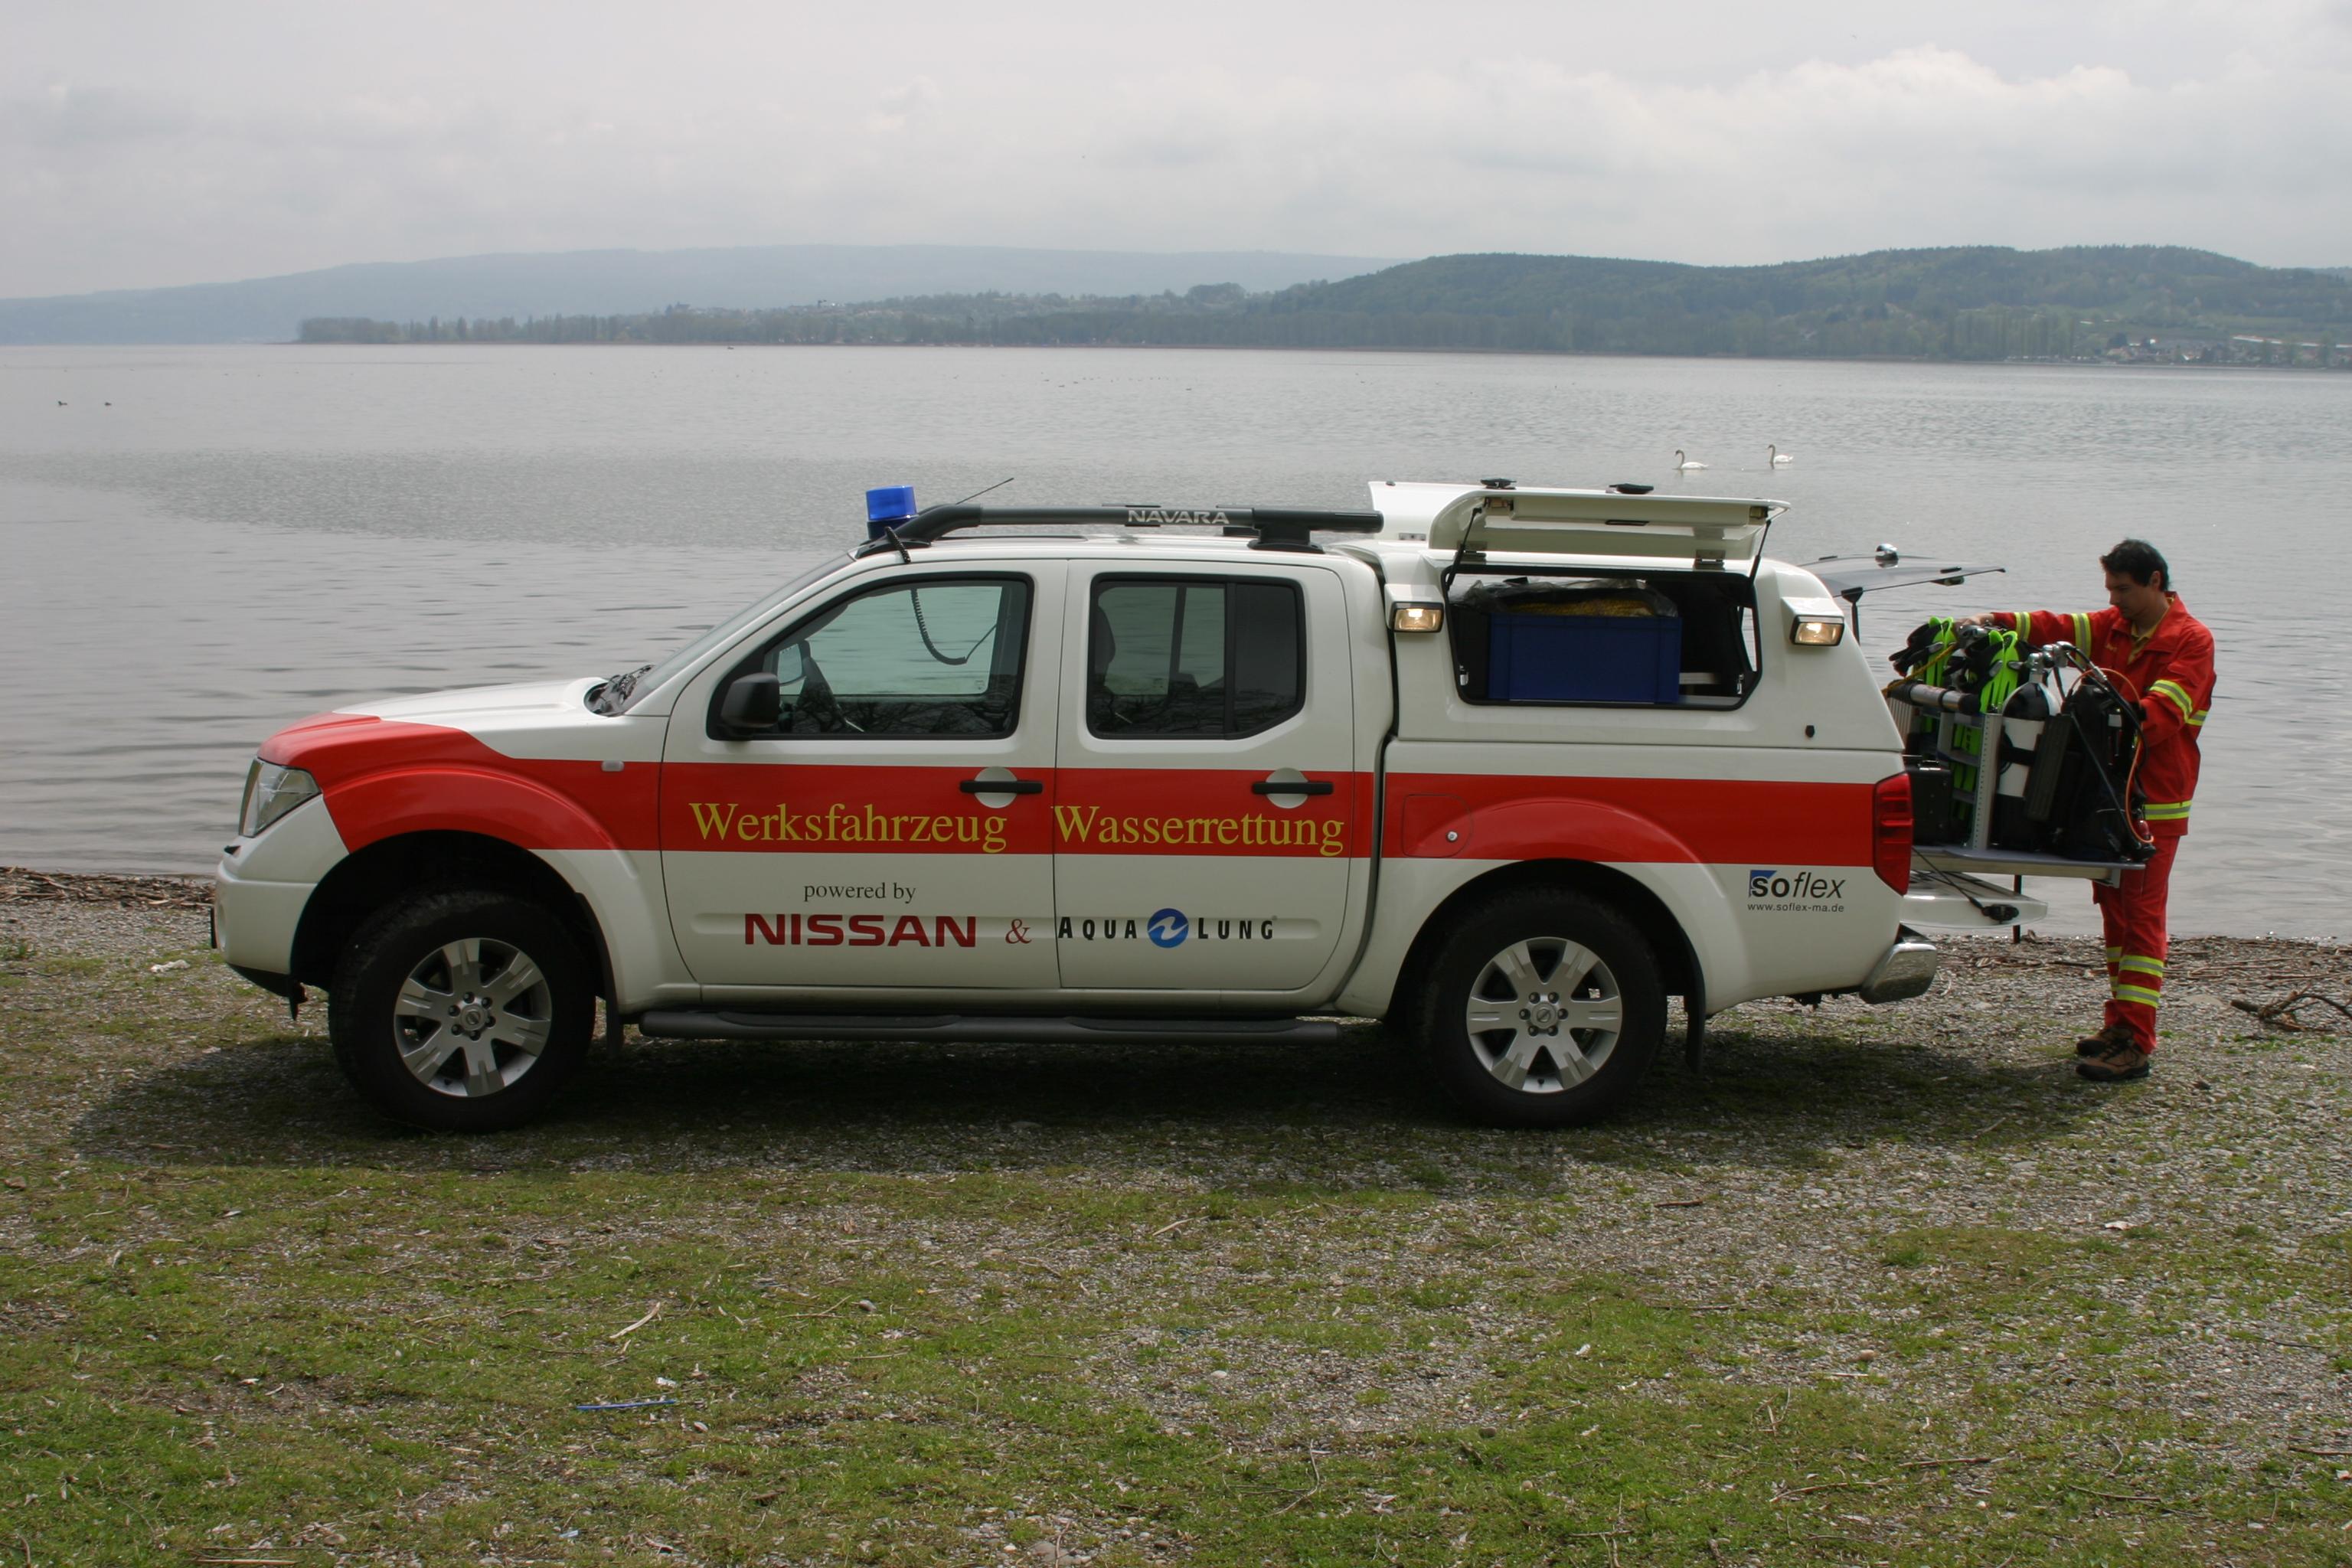 Nissan germanez de intervenție